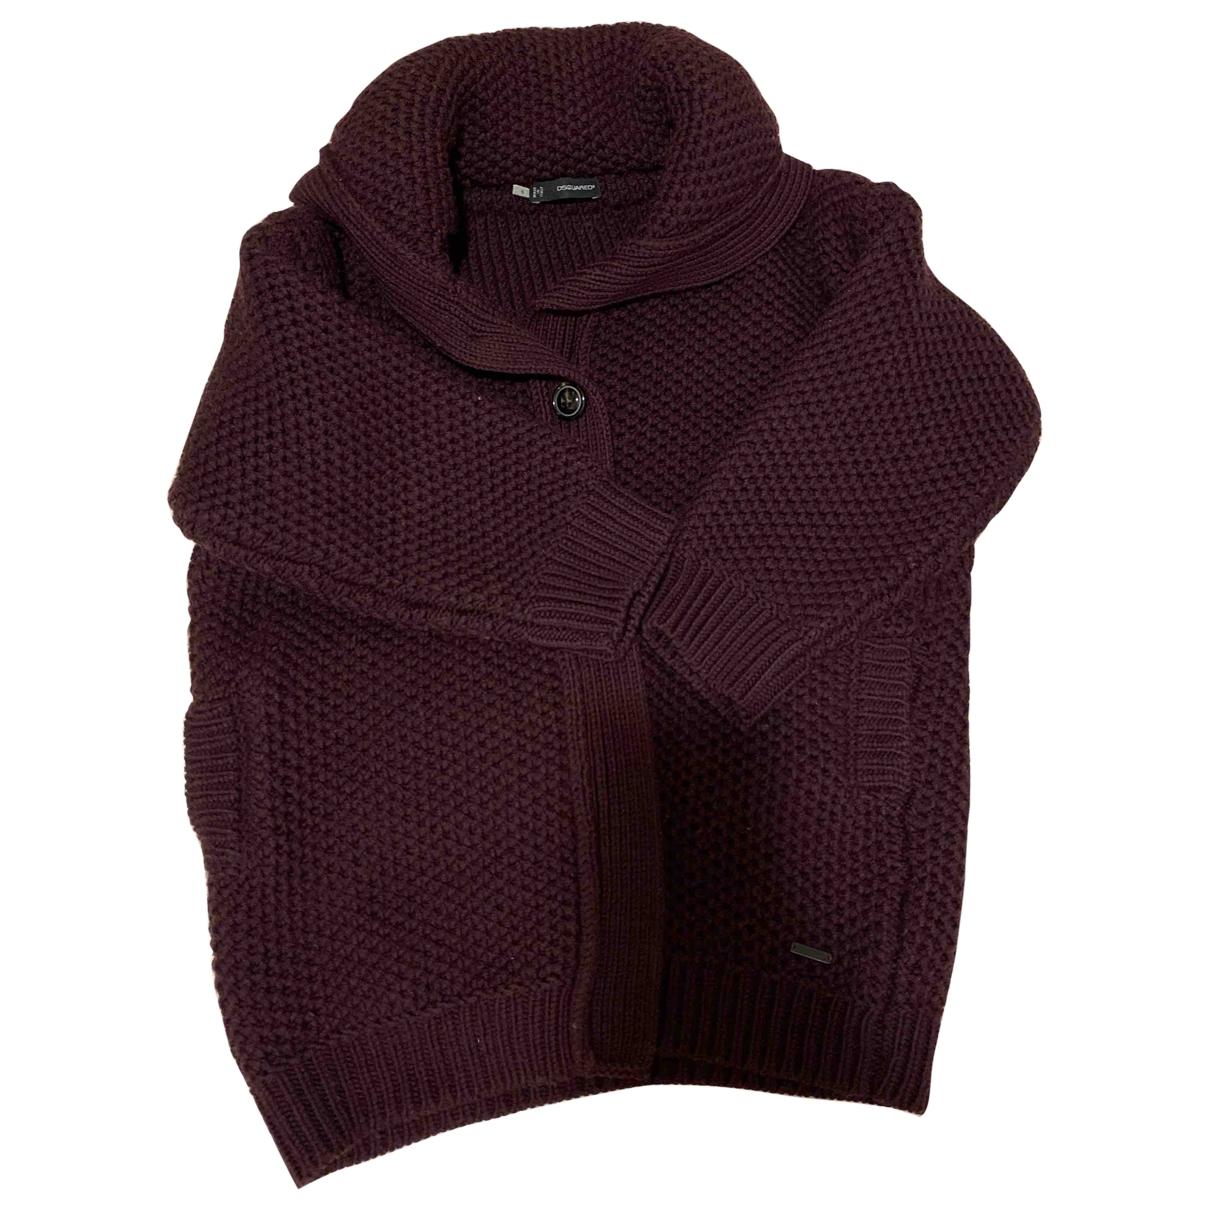 Dsquared2 \N Burgundy Wool jacket for Women S International